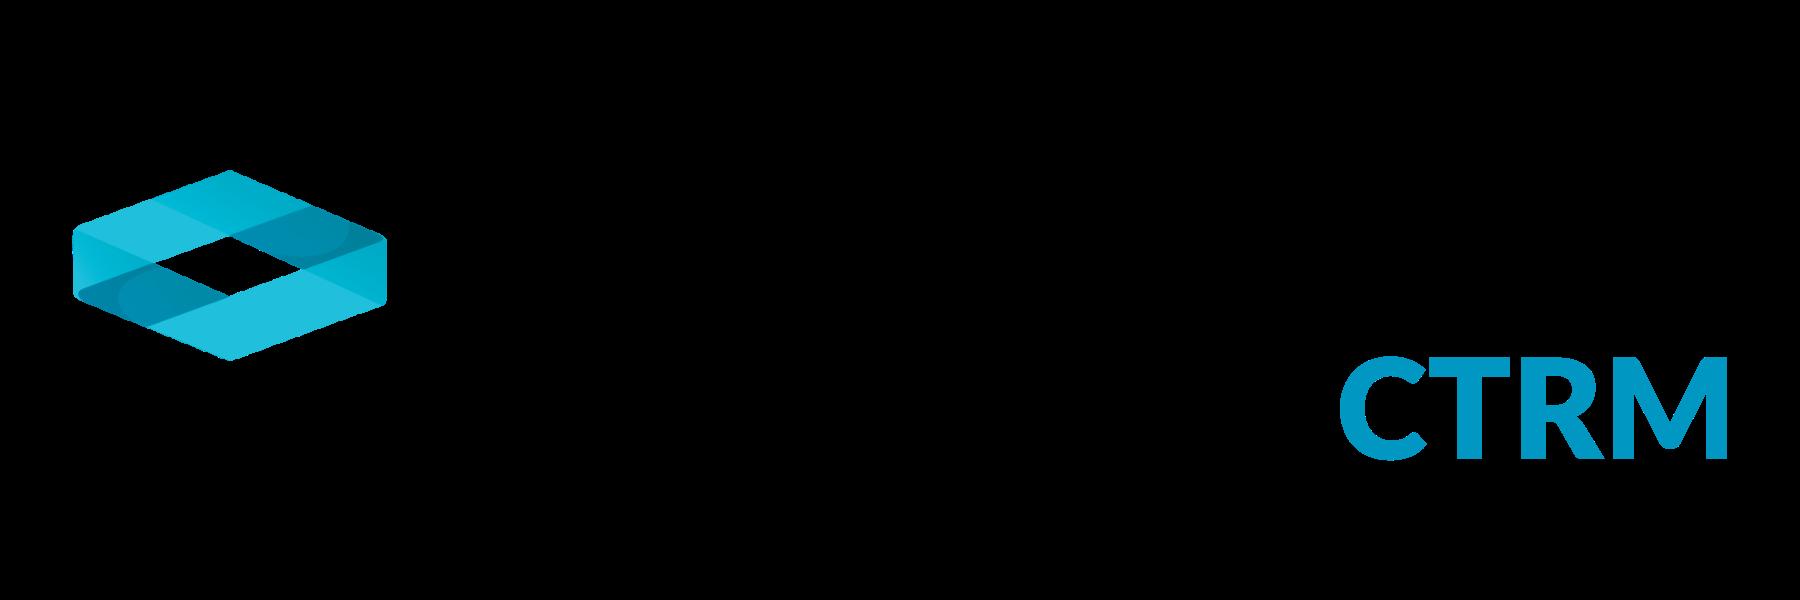 MineMarket CTRM Logo